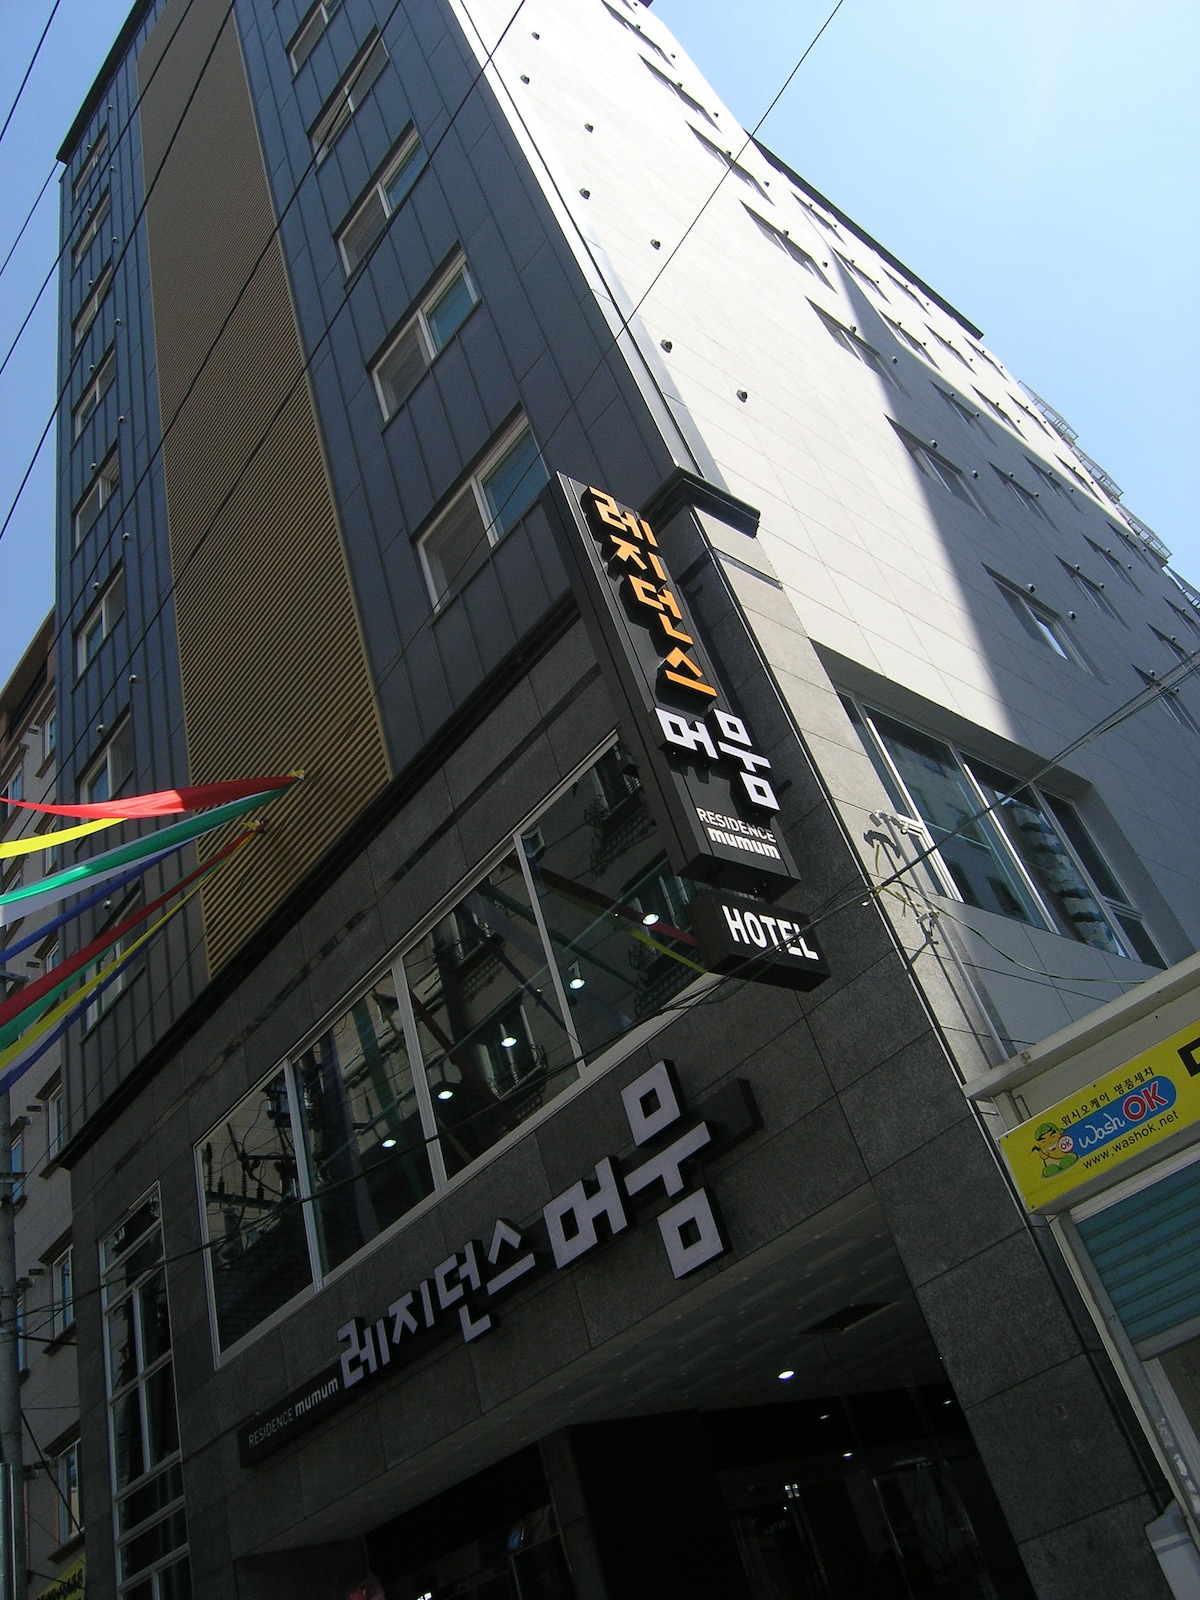 Mumum from 대한민국 부산광역시